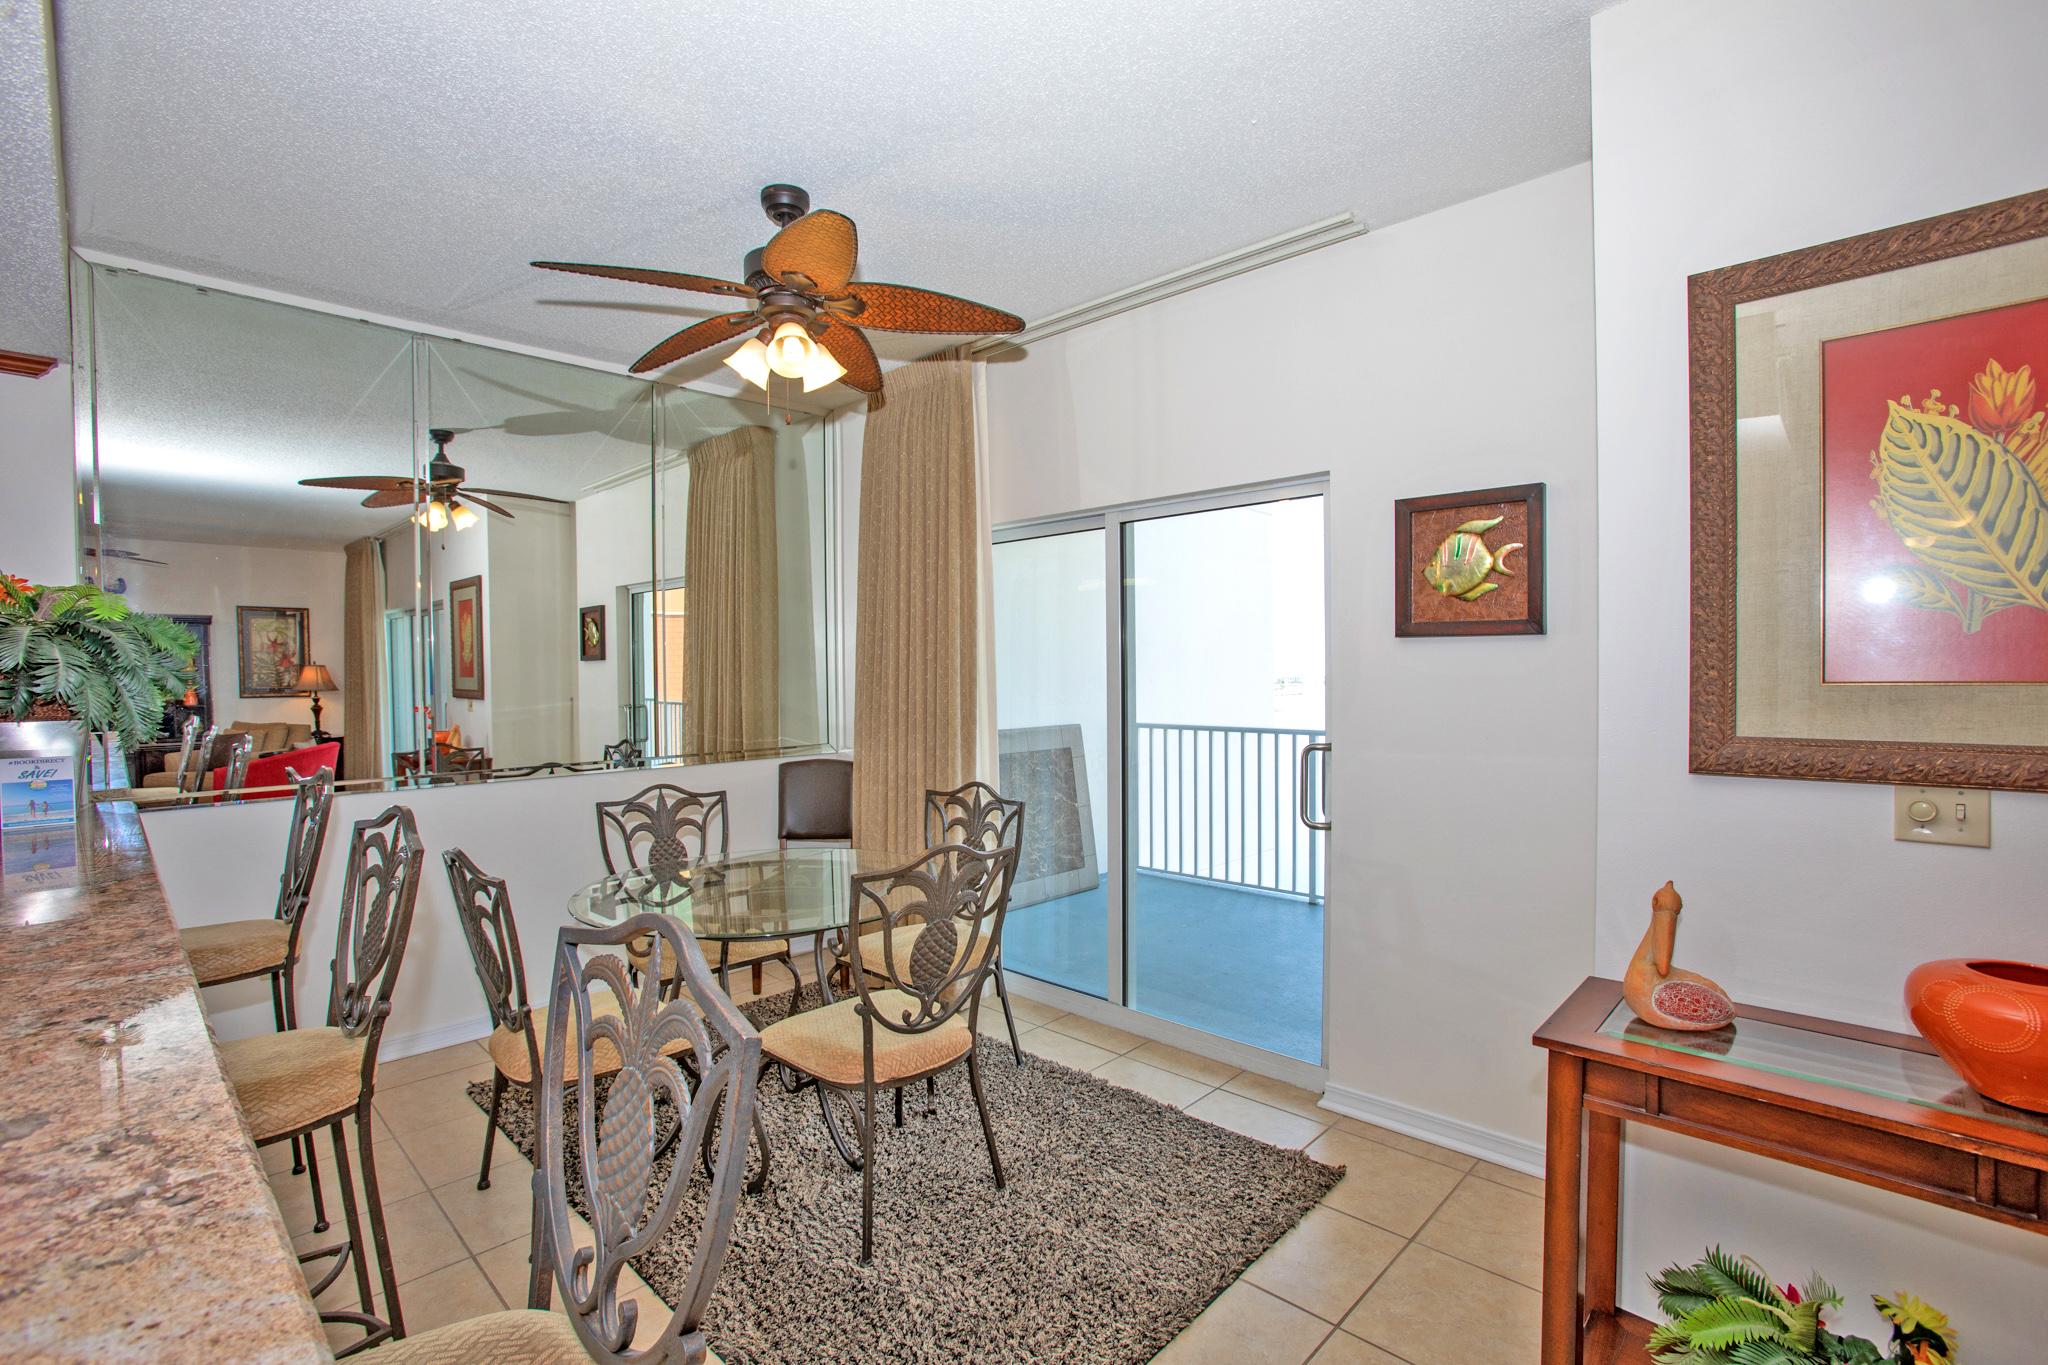 South Harbour #7E Condo rental in South Harbour ~ Pensacola Beach Vacation Rentals by BeachGuide in Pensacola Beach Florida - #13